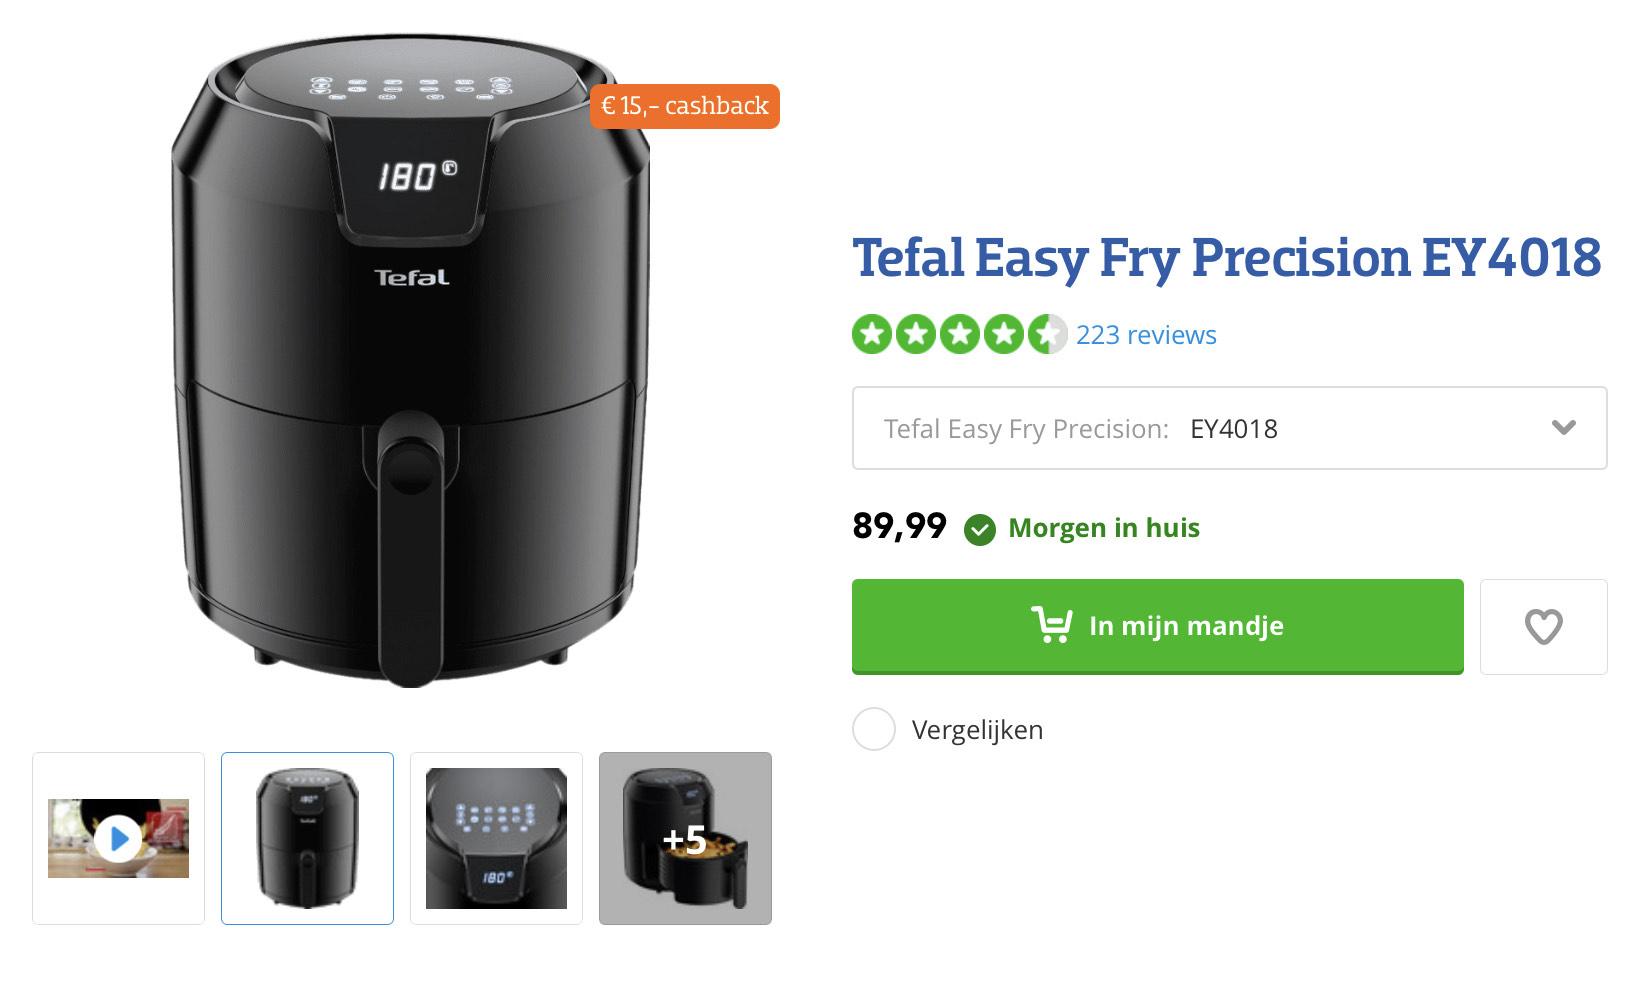 Tefal Easy Fry Precision EY4018 (cashback)